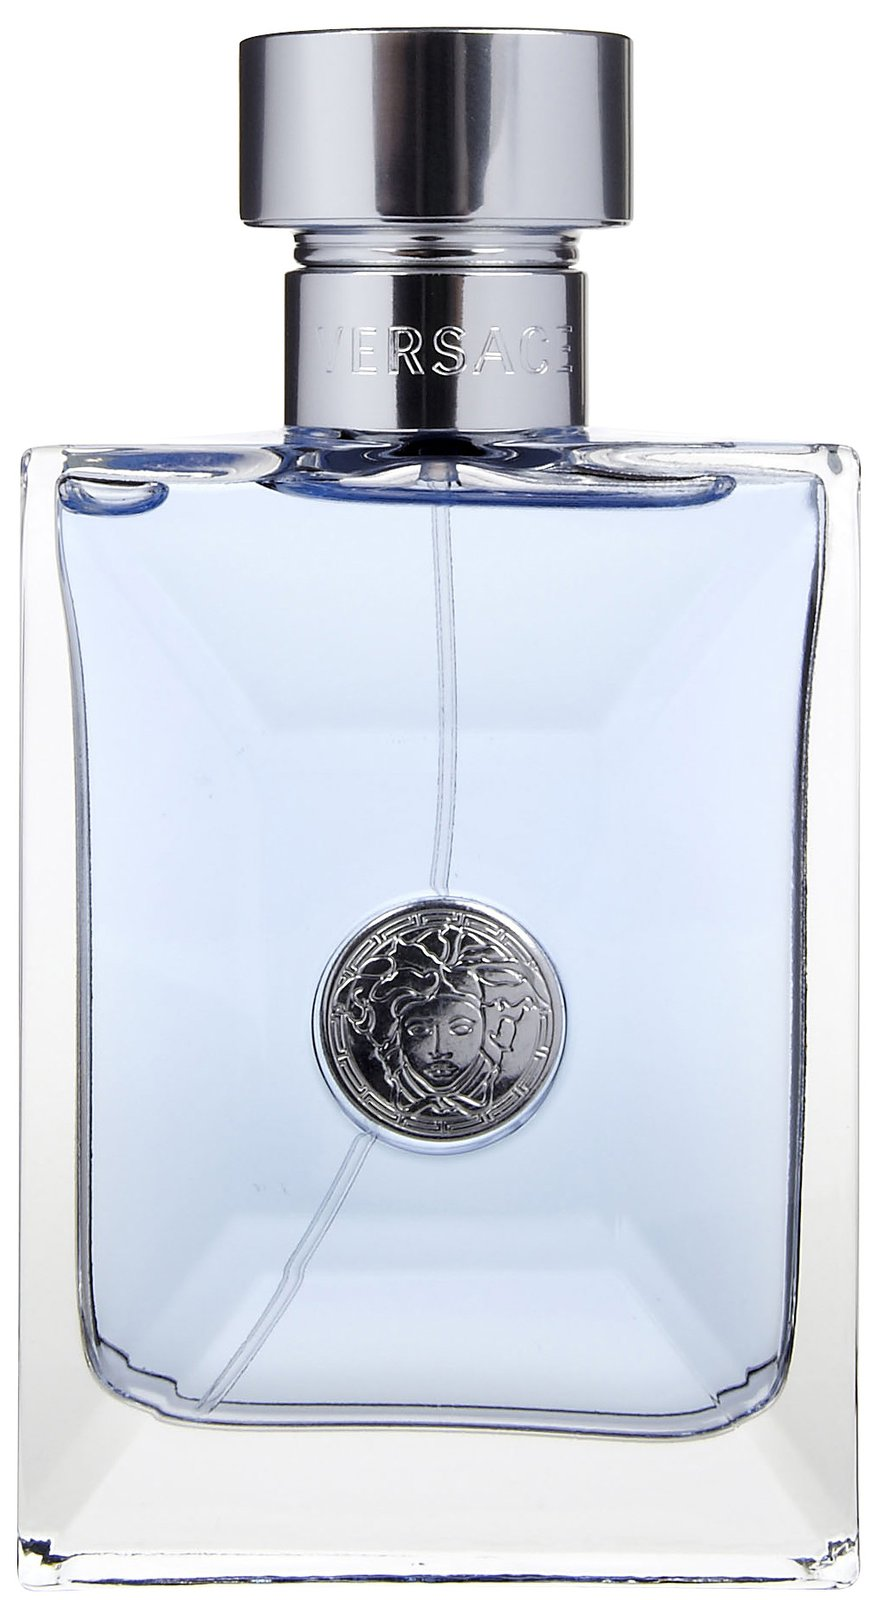 Tualetinis vanduo Versace Pour Homme EDT vyrams 100 ml